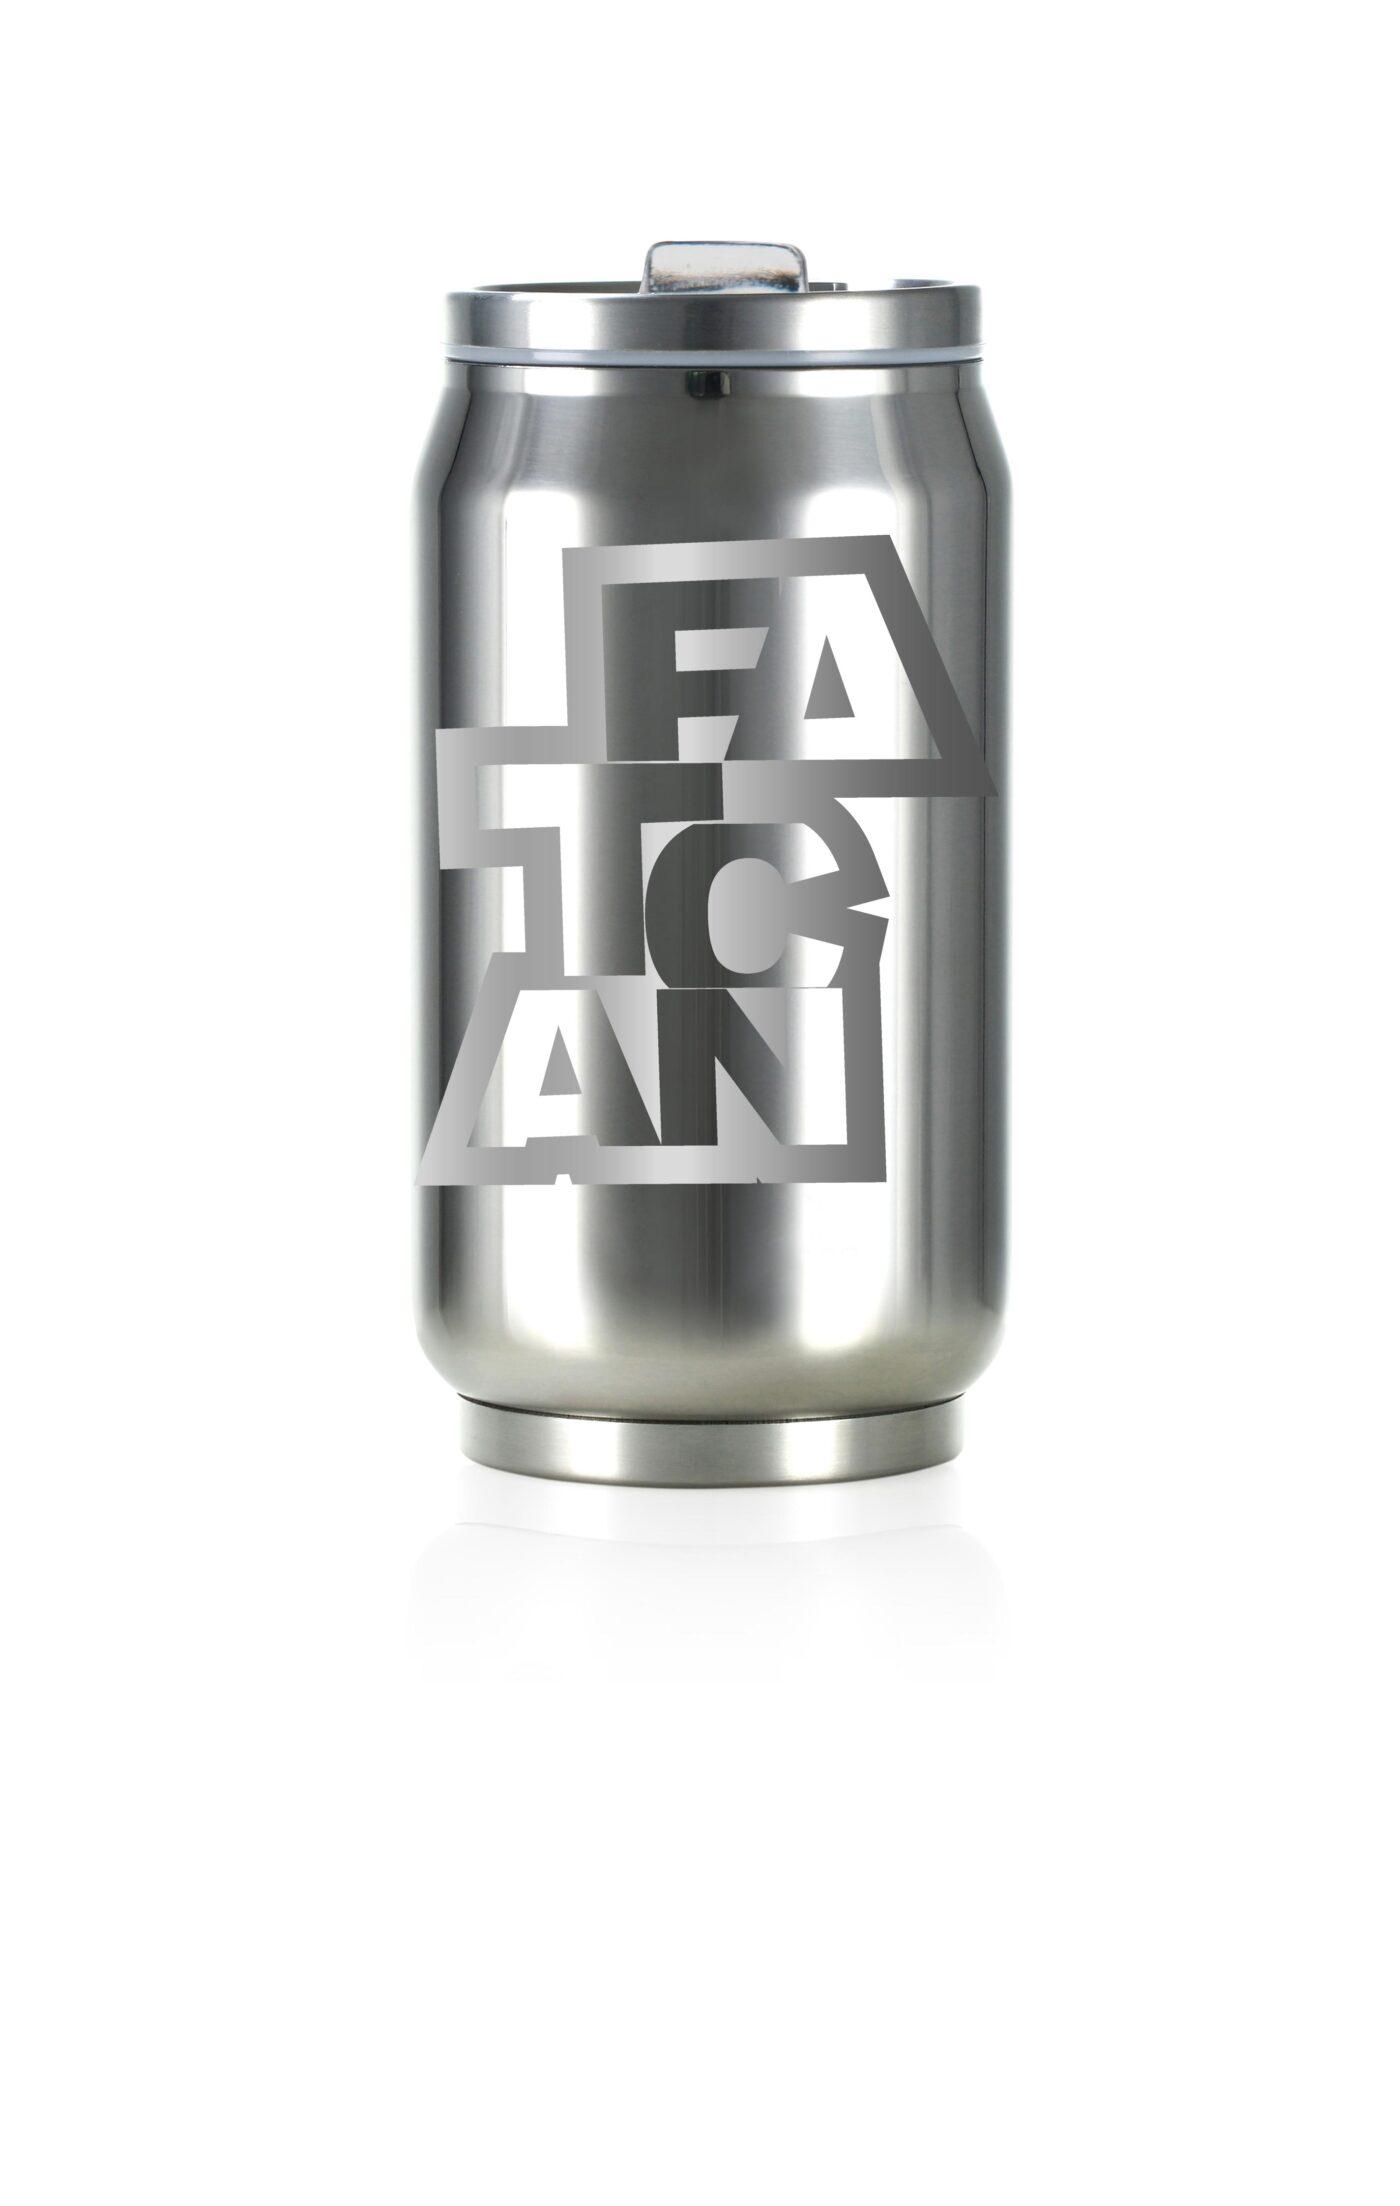 FATCAN_mirror_025